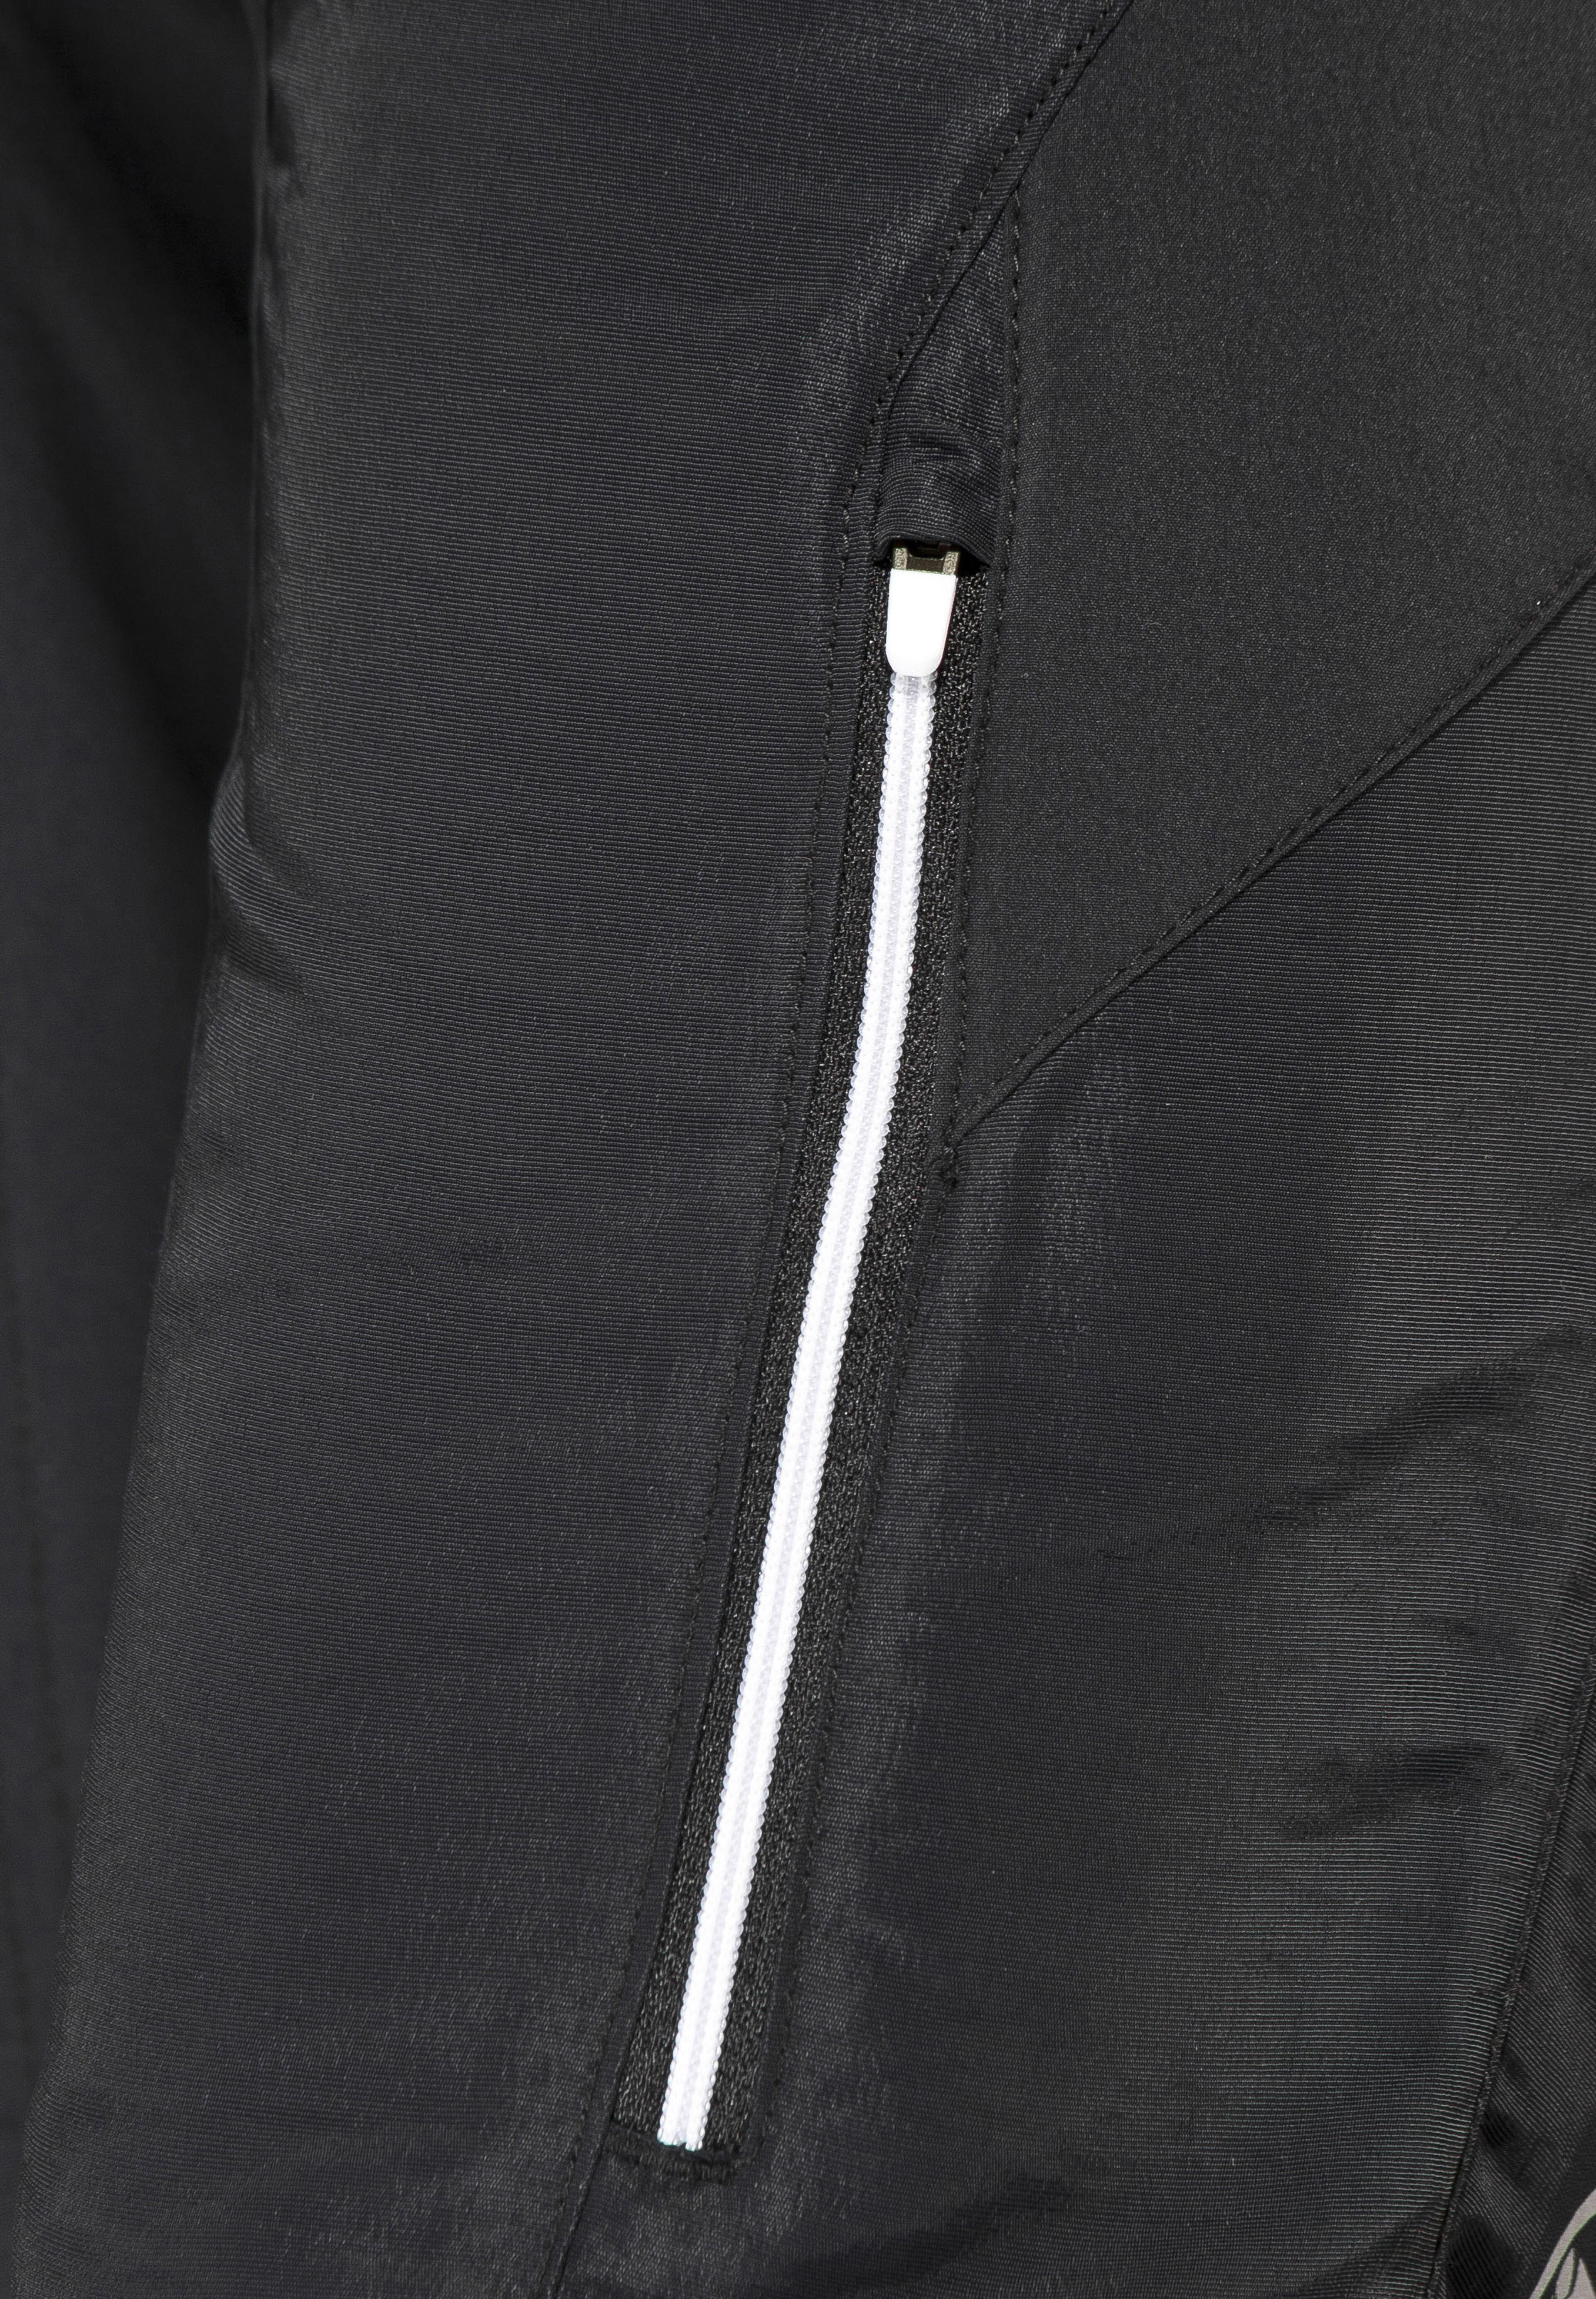 465932b883 Endura Singletrack III - Culotte corto sin tirantes Hombre - con pantalón  interno negro